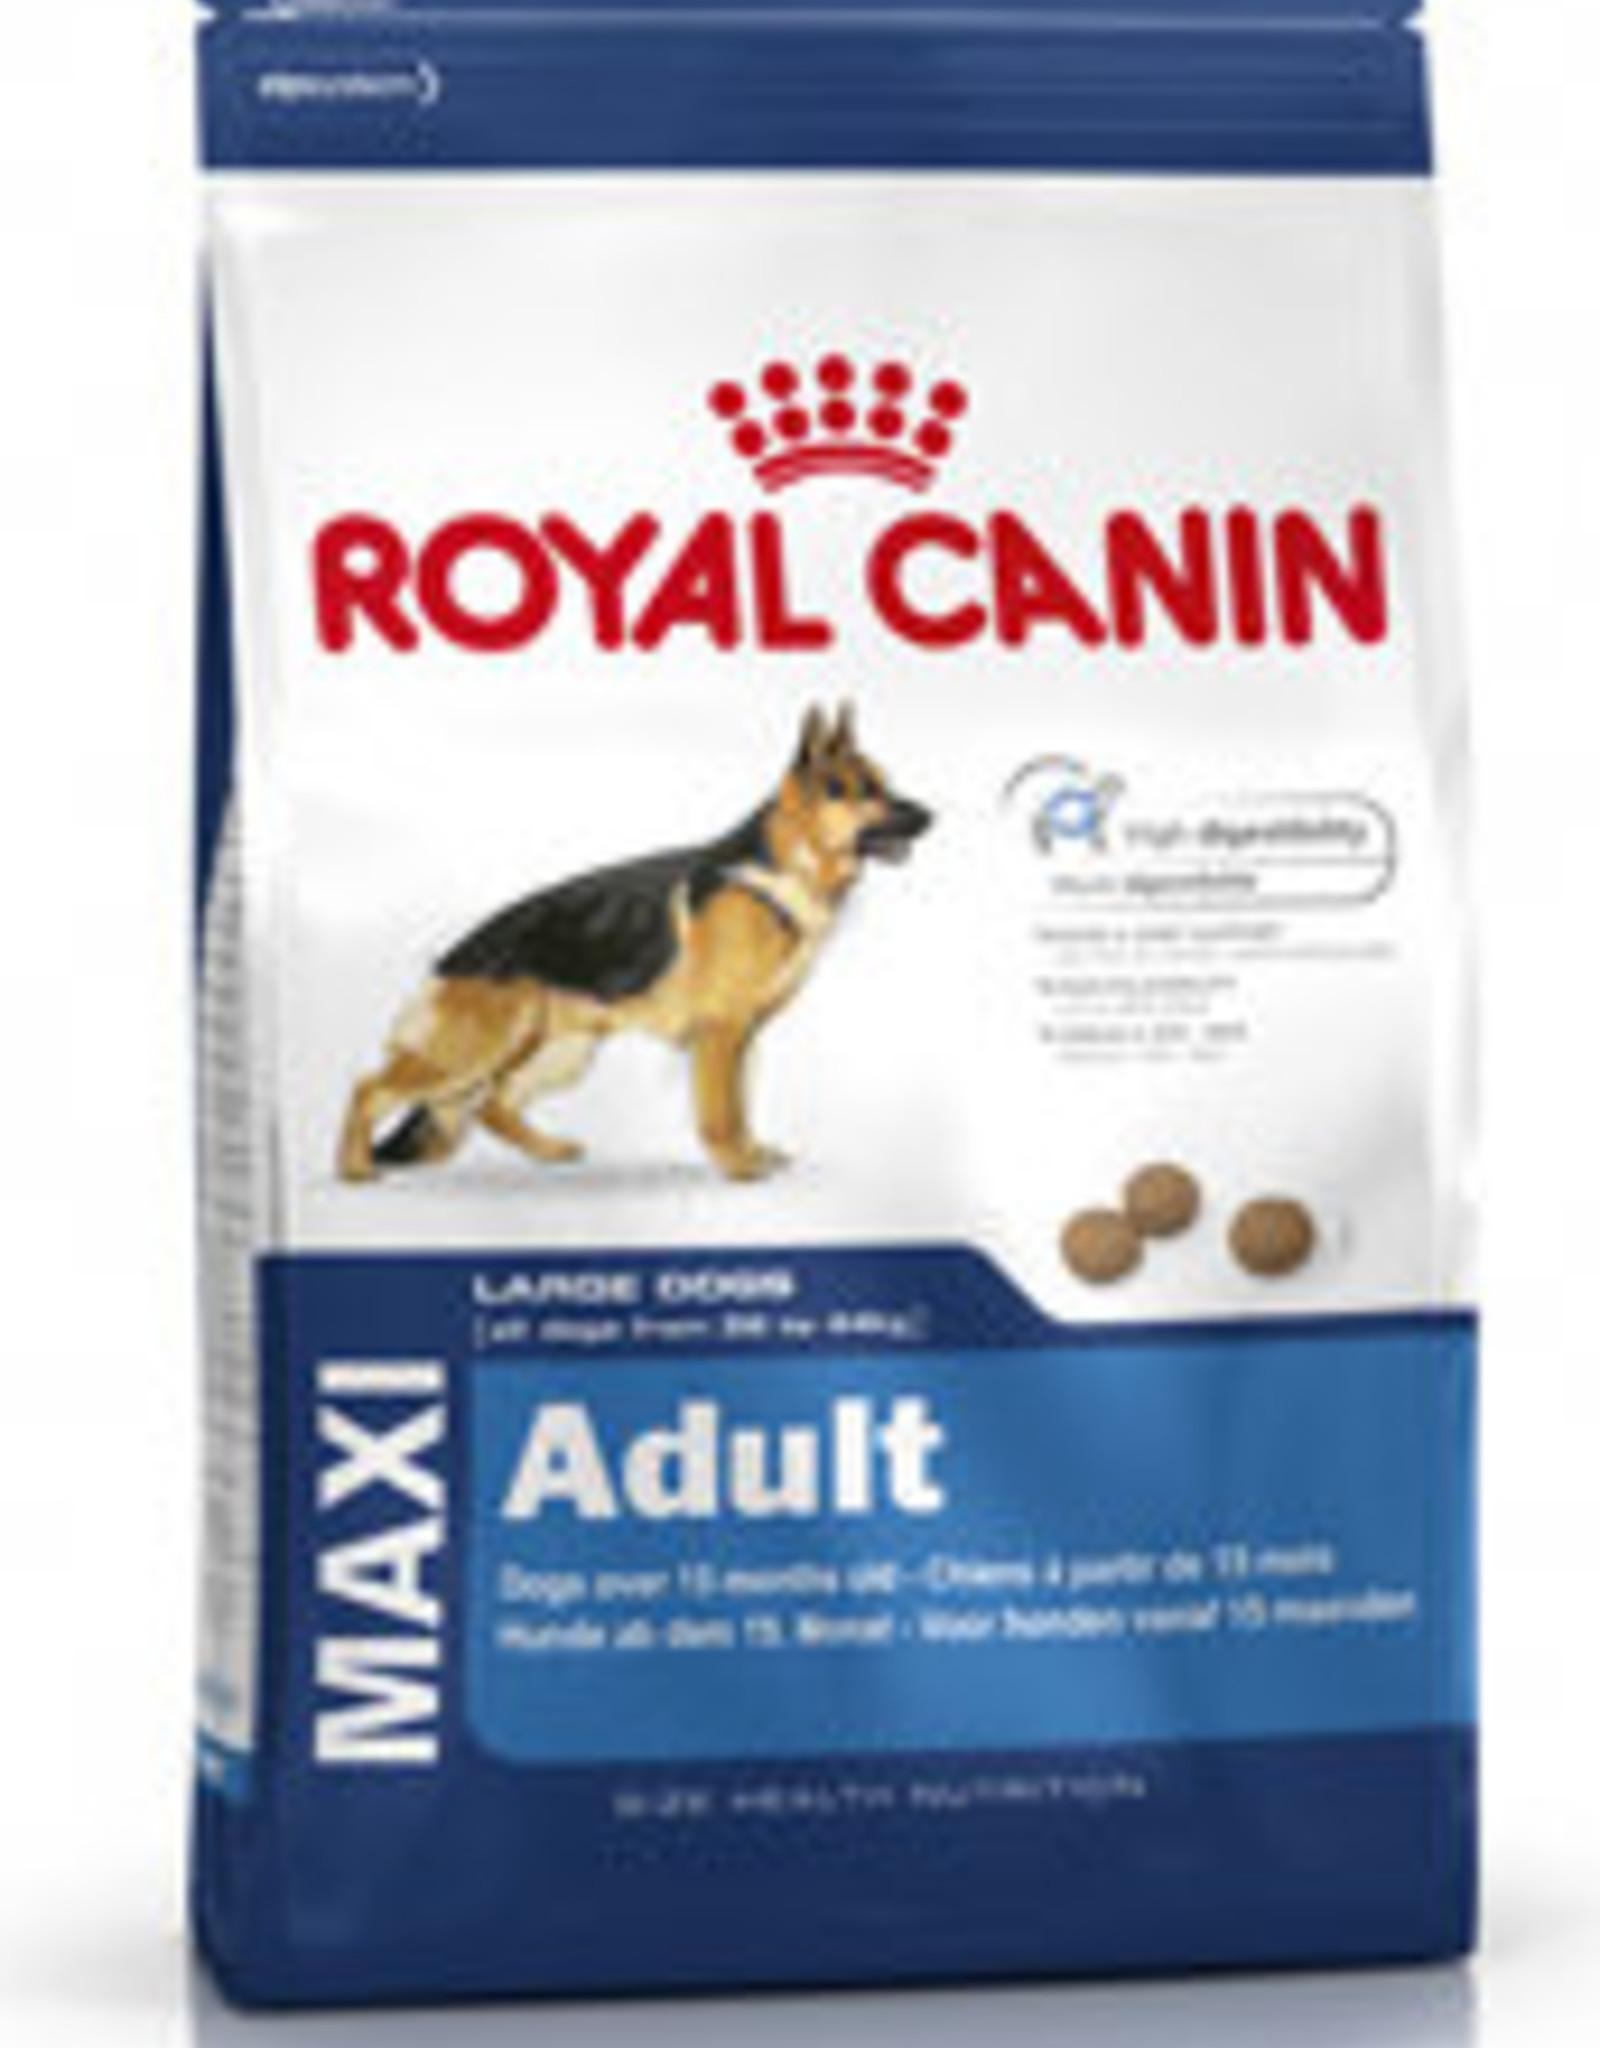 Royal Canin Royal Canin Shn Maxi Adult Hond 15kg